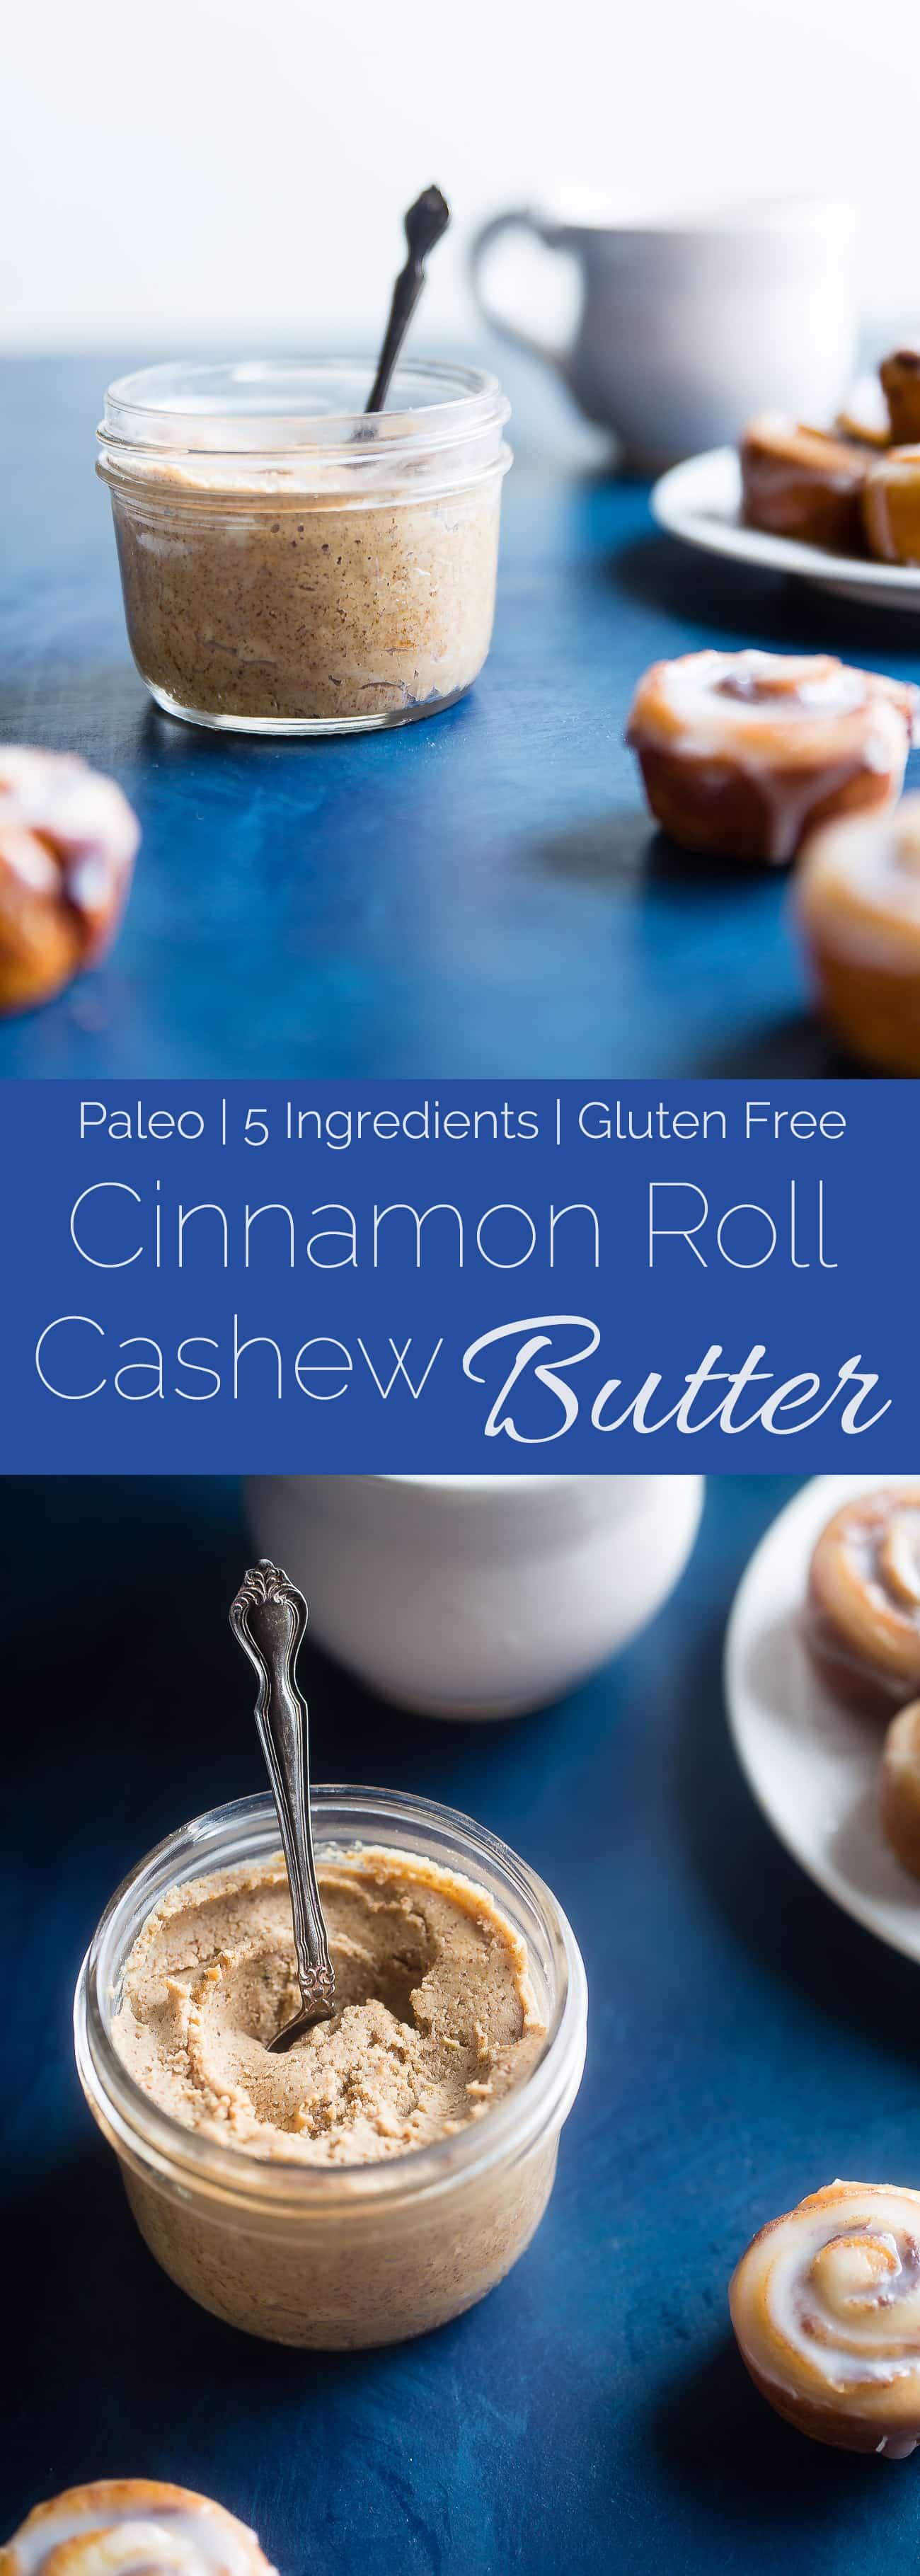 Collage image of homemade cinnamon roll cashew butter. Recipe on Foodfaithfitness.com